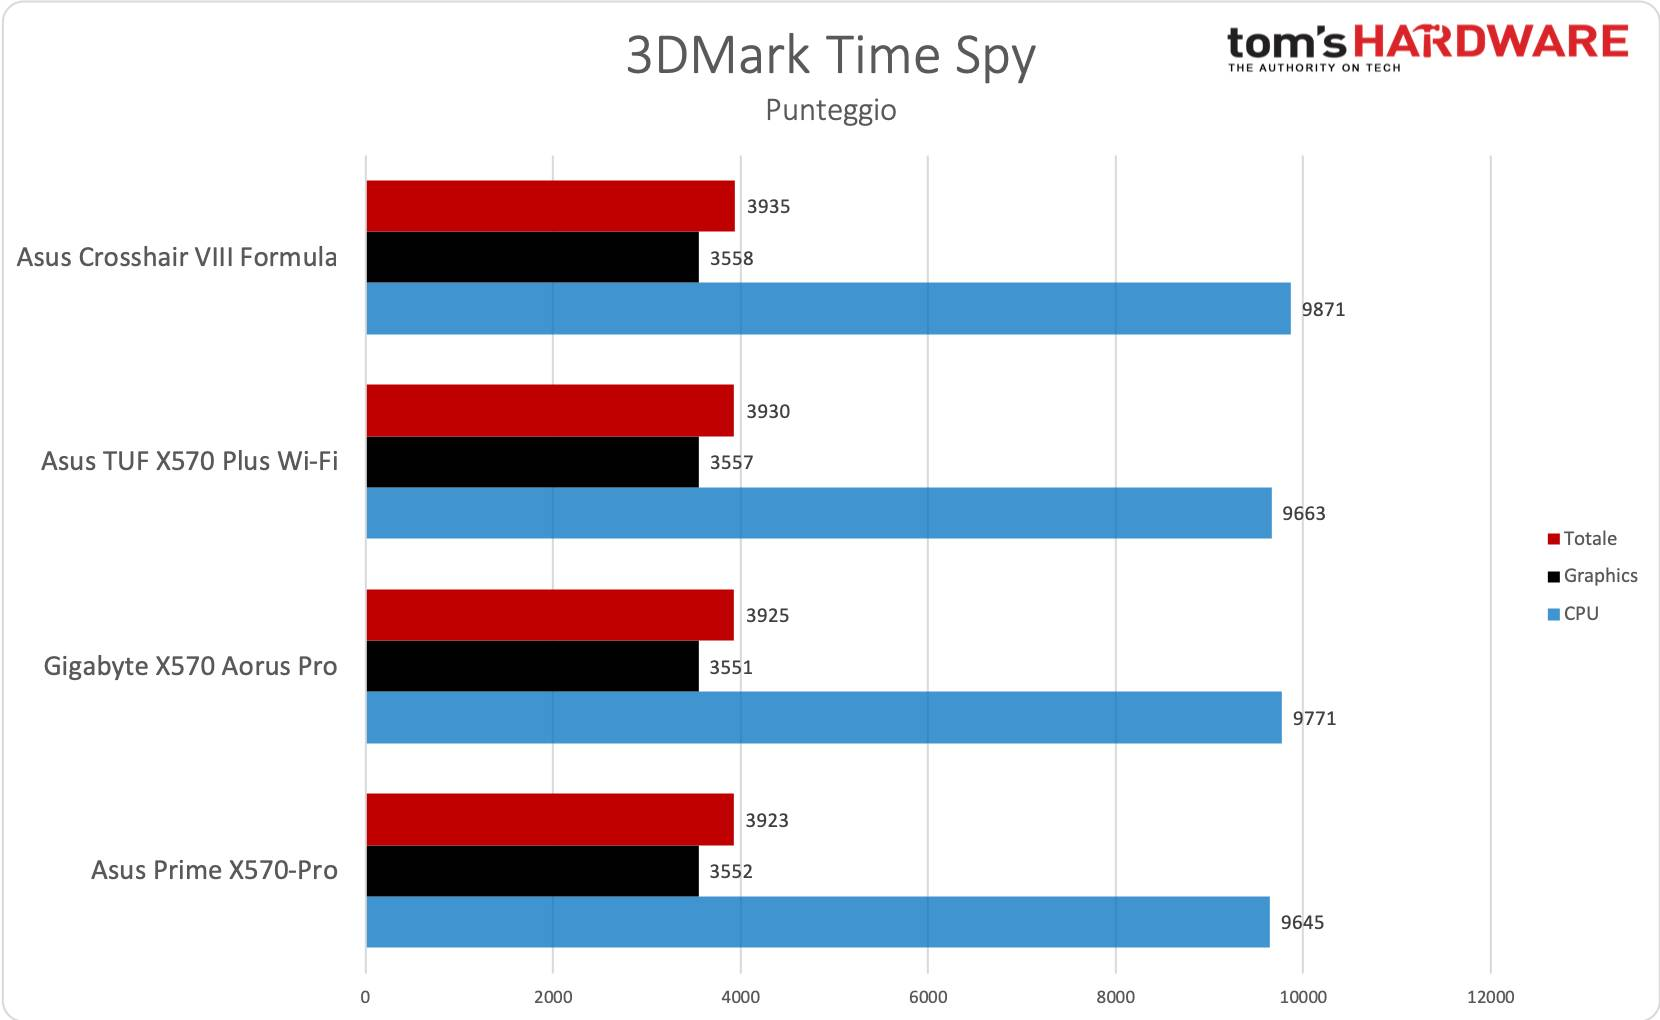 Crosshair VIII Formula - 3DMark Time Spy